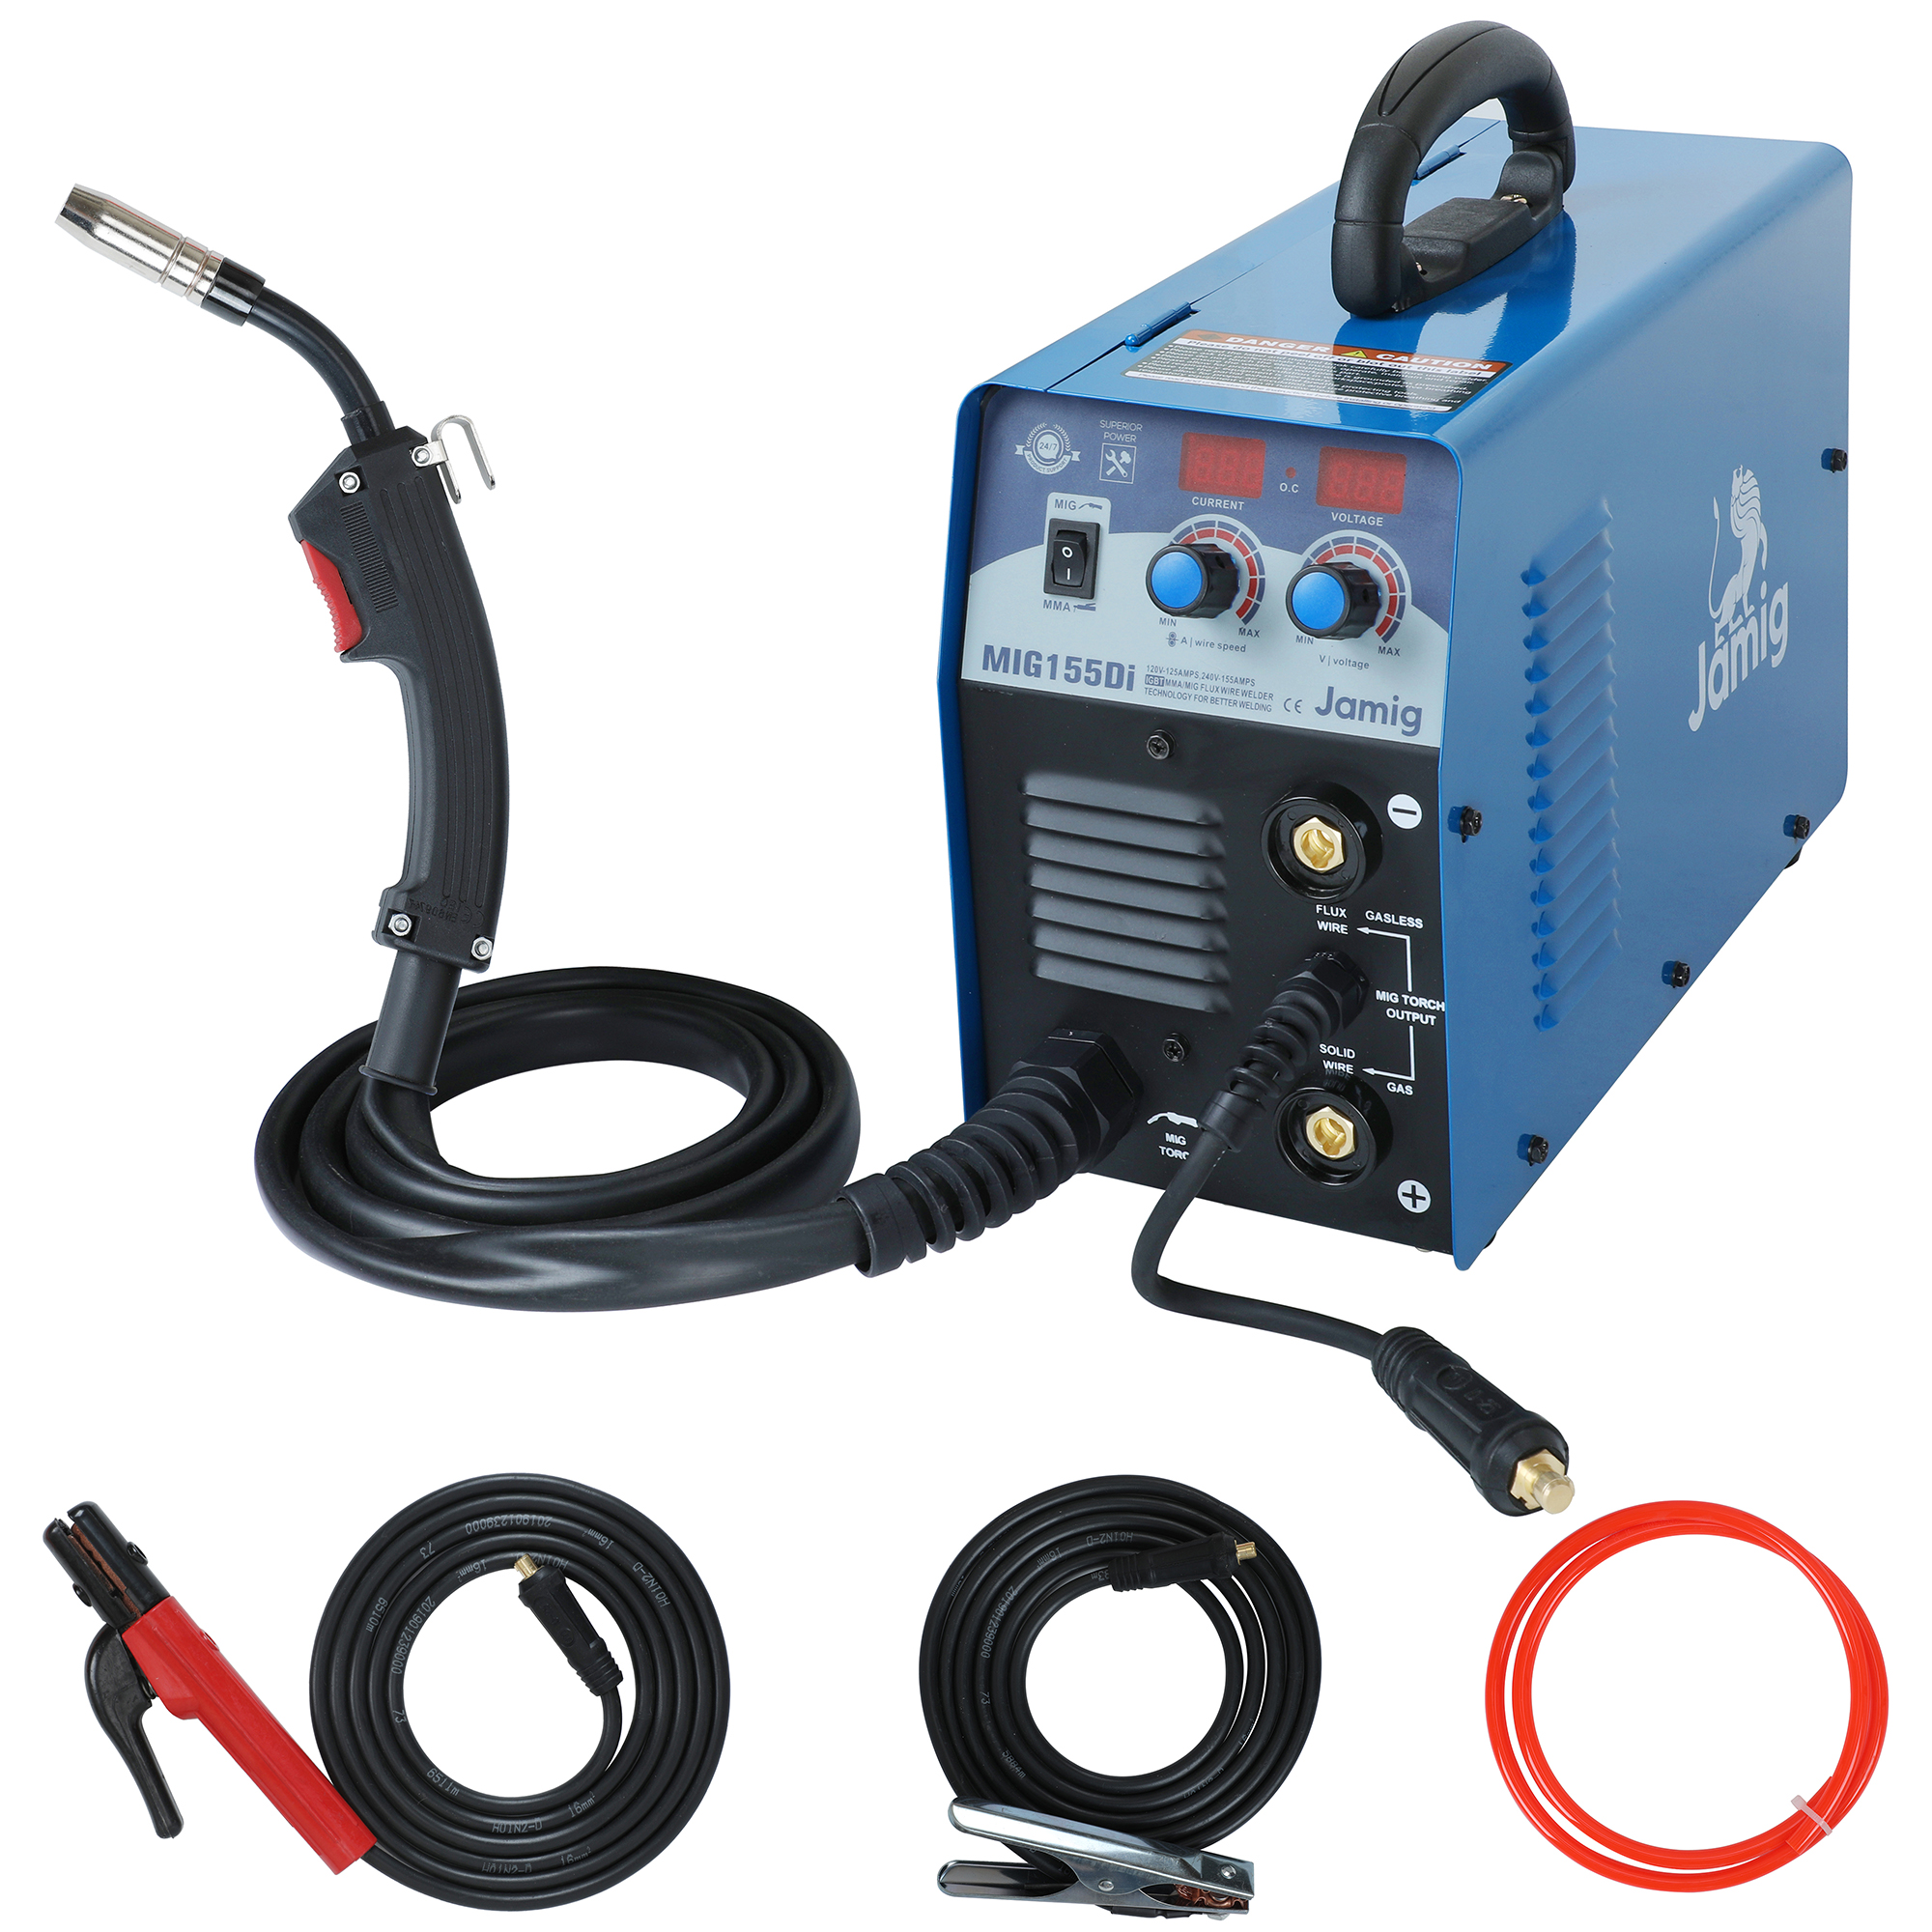 IGBT MMA/MIG/Fluxo de fio/fio Sólido Máquina de solda Dupla voltagem 110 V/220 V MIG155Di solda MIG Portátil de Solda Mig MMA